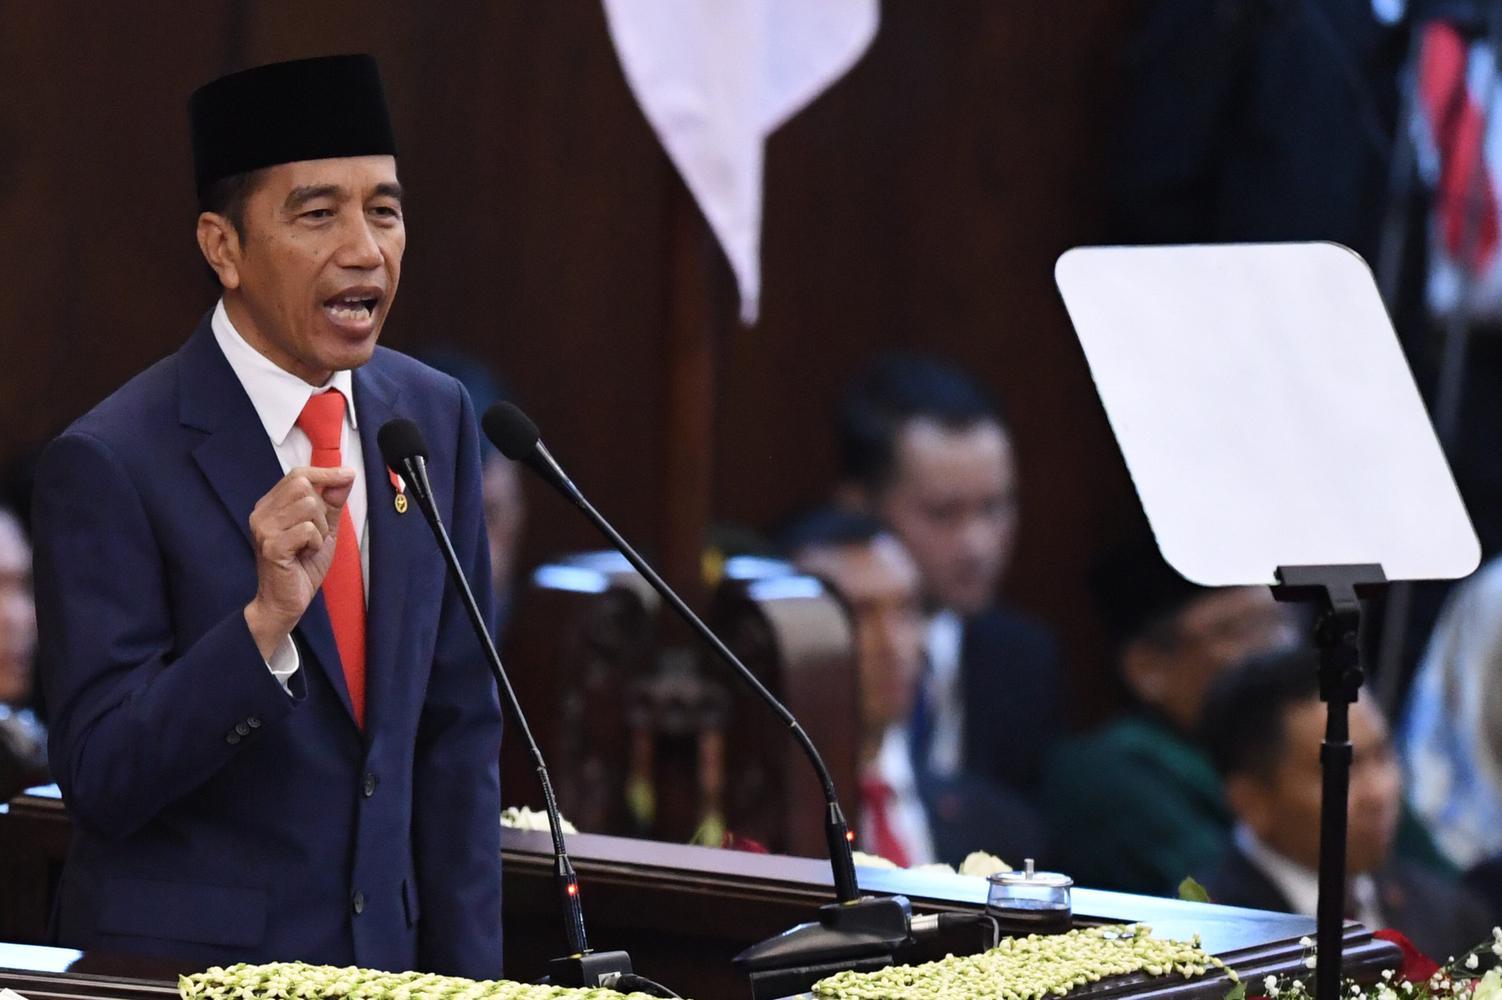 Presiden Joko Widodo berpidato usai dilantik menjadi presiden periode 2019-2024 di Gedung Nusantara, kompleks Parlemen, Senayan, Jakarta, Minggu (20/10/2019).